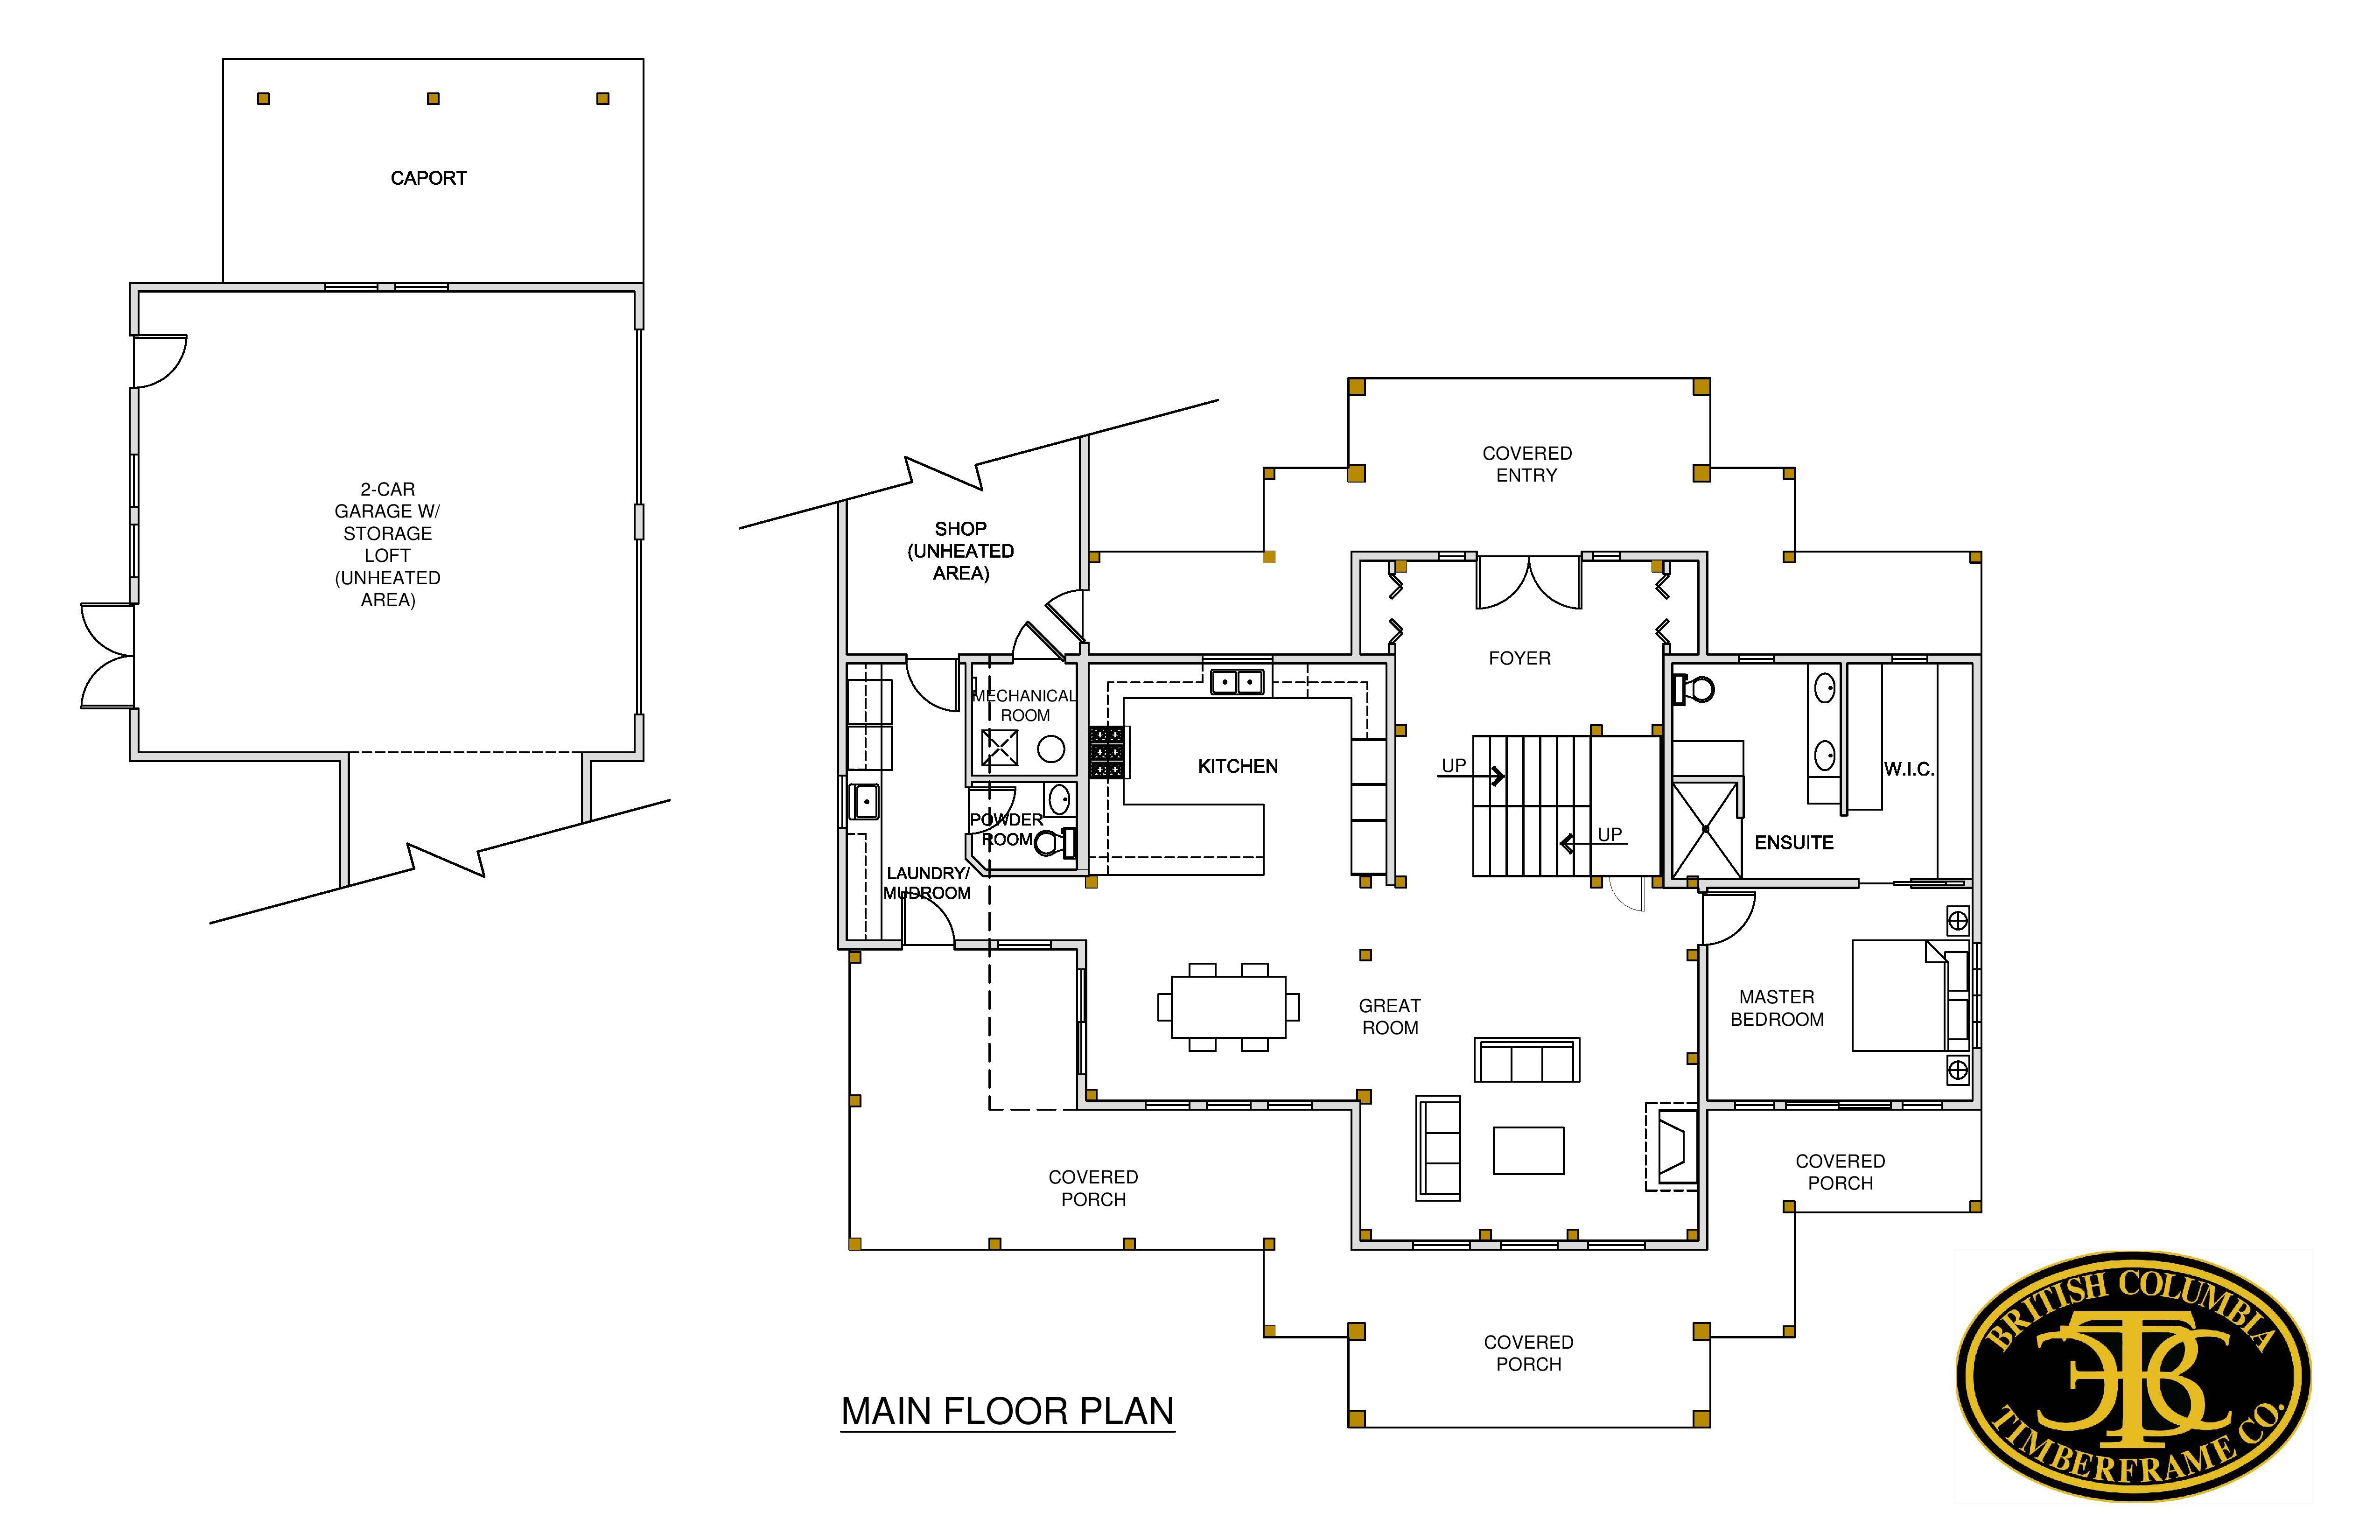 Leavenworth_Main Floor Plan-page-001